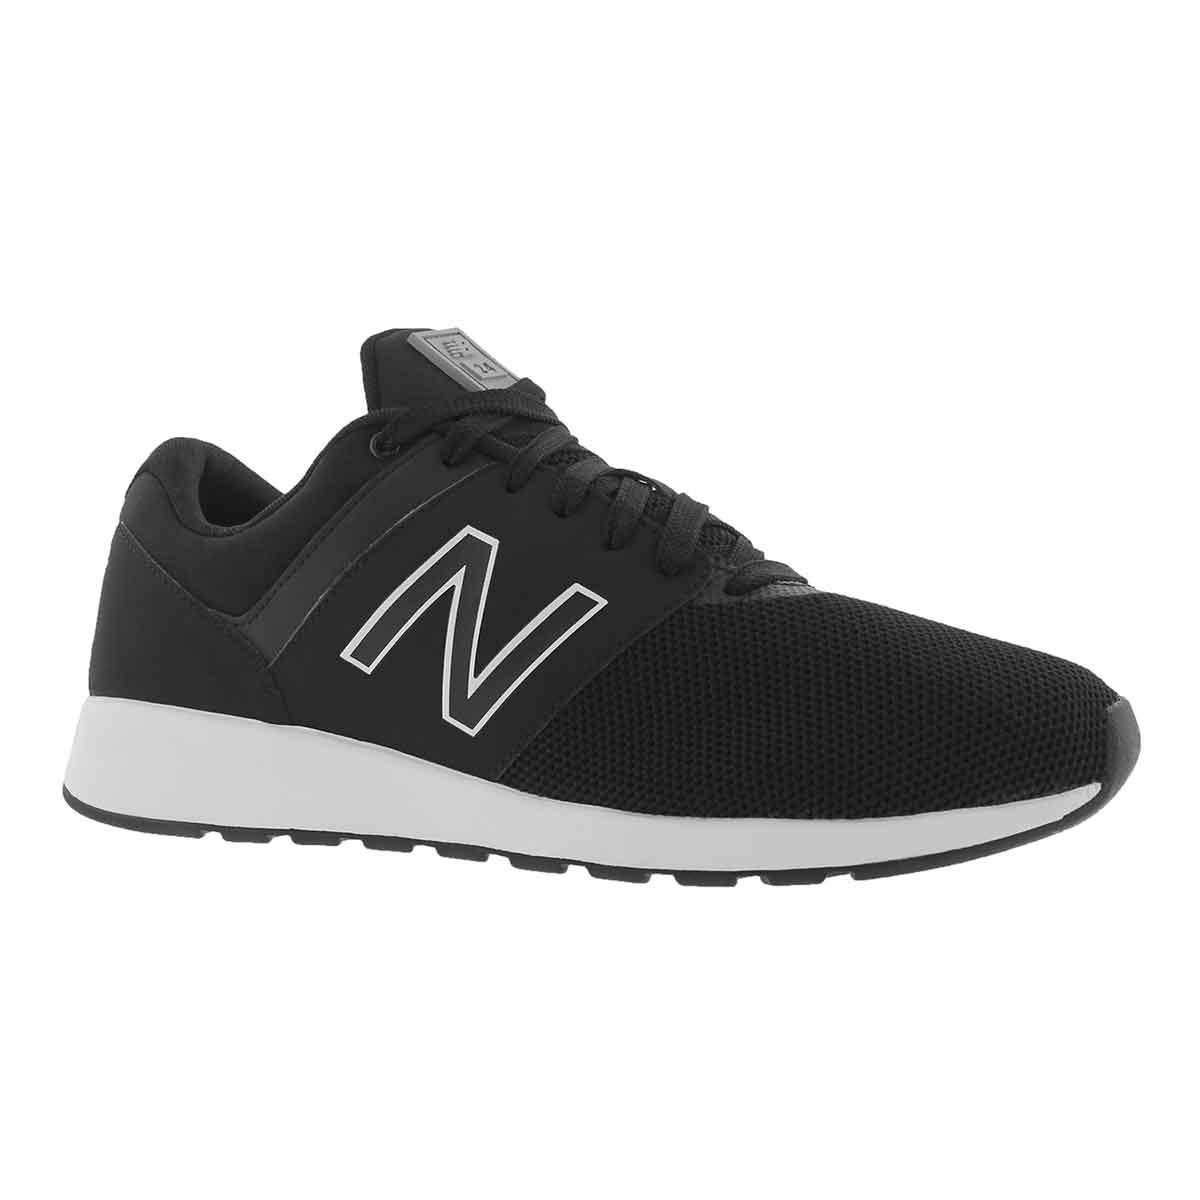 Men's 24 black/steel lace up sneakers